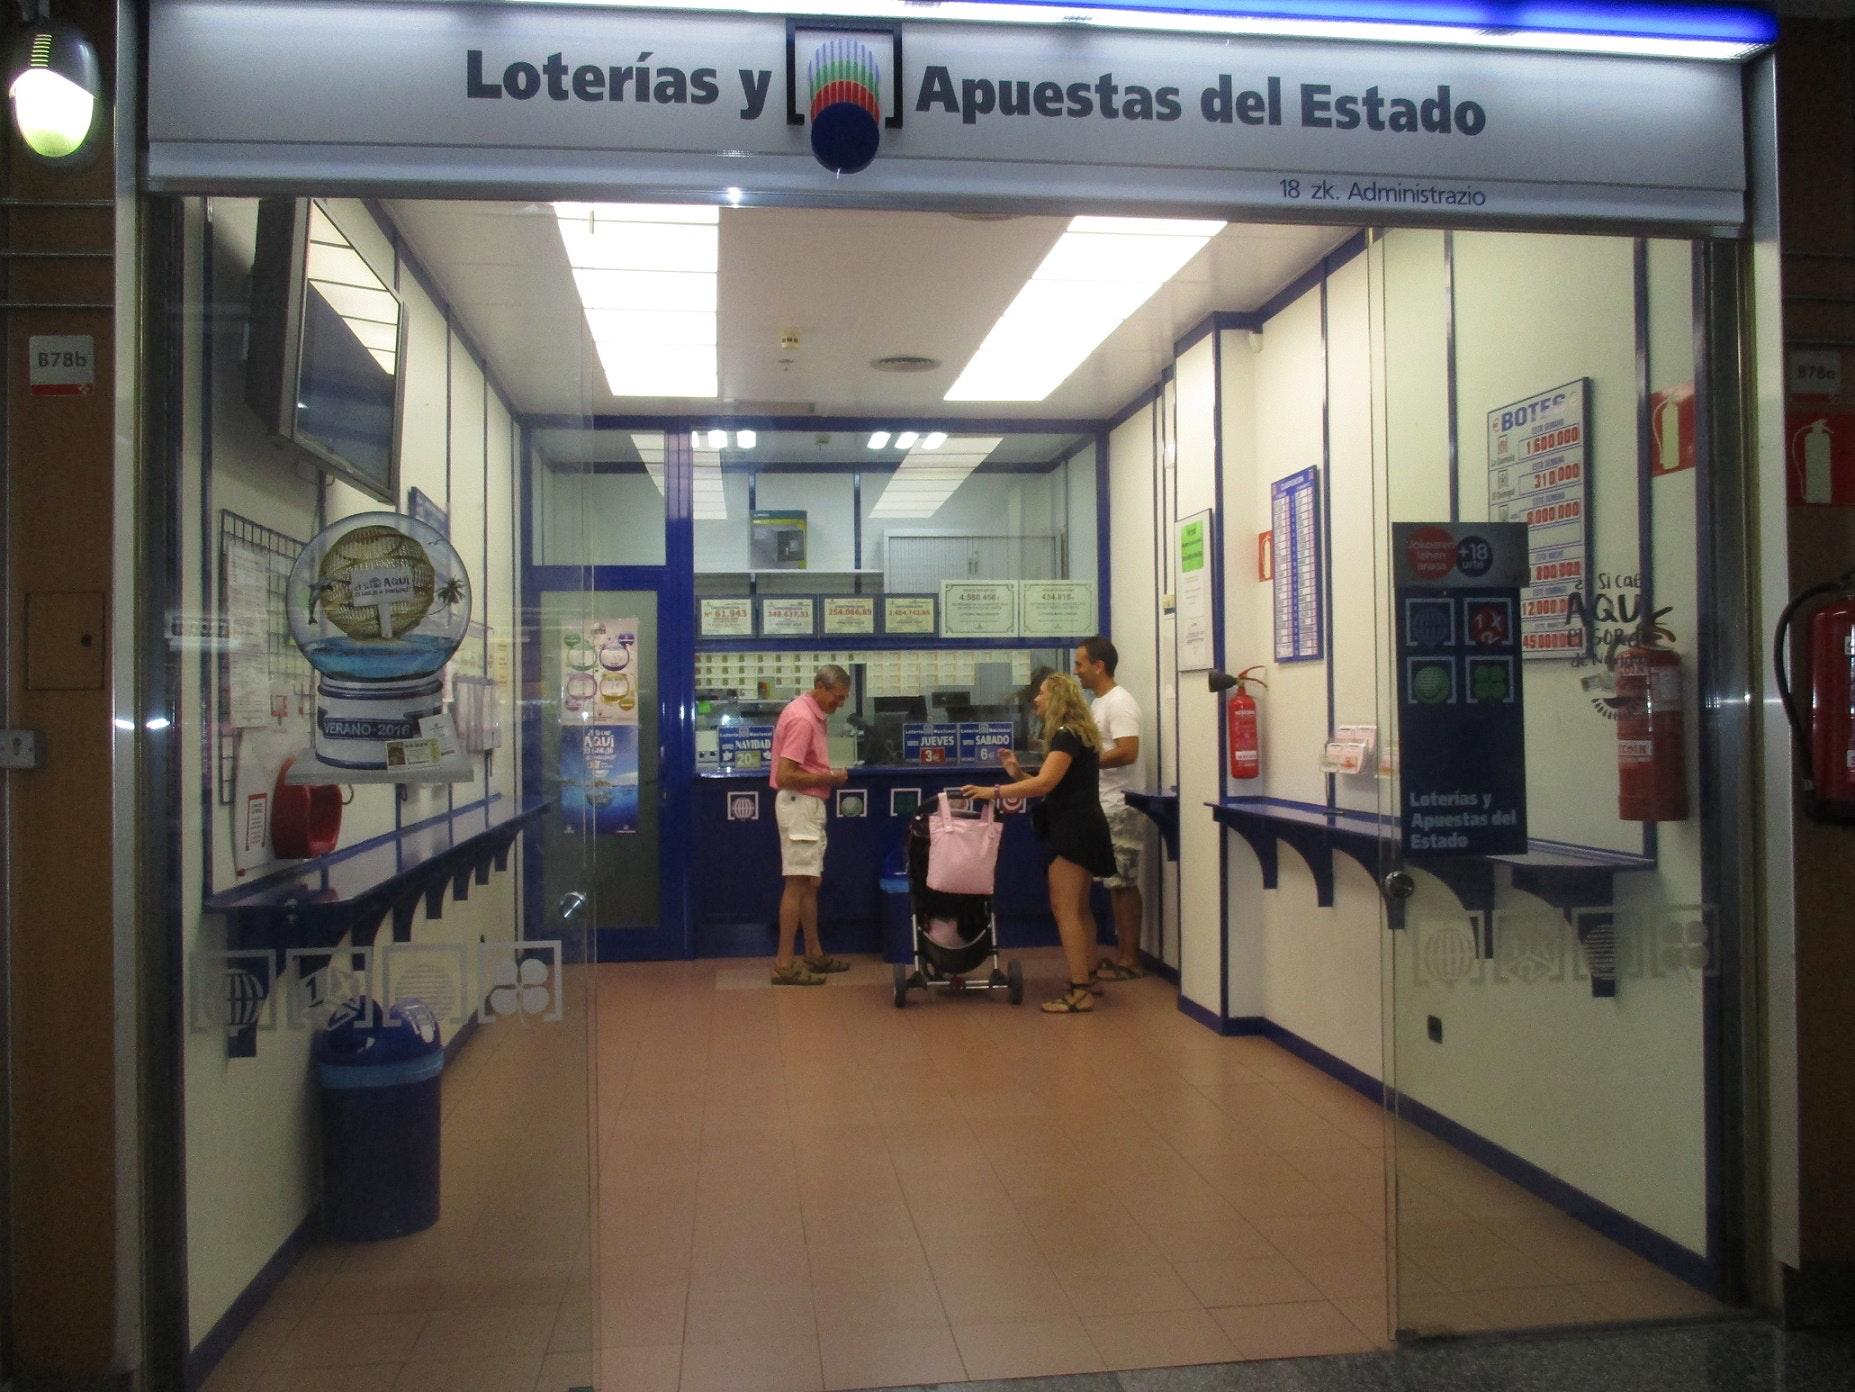 LOTERIAS TIENDA